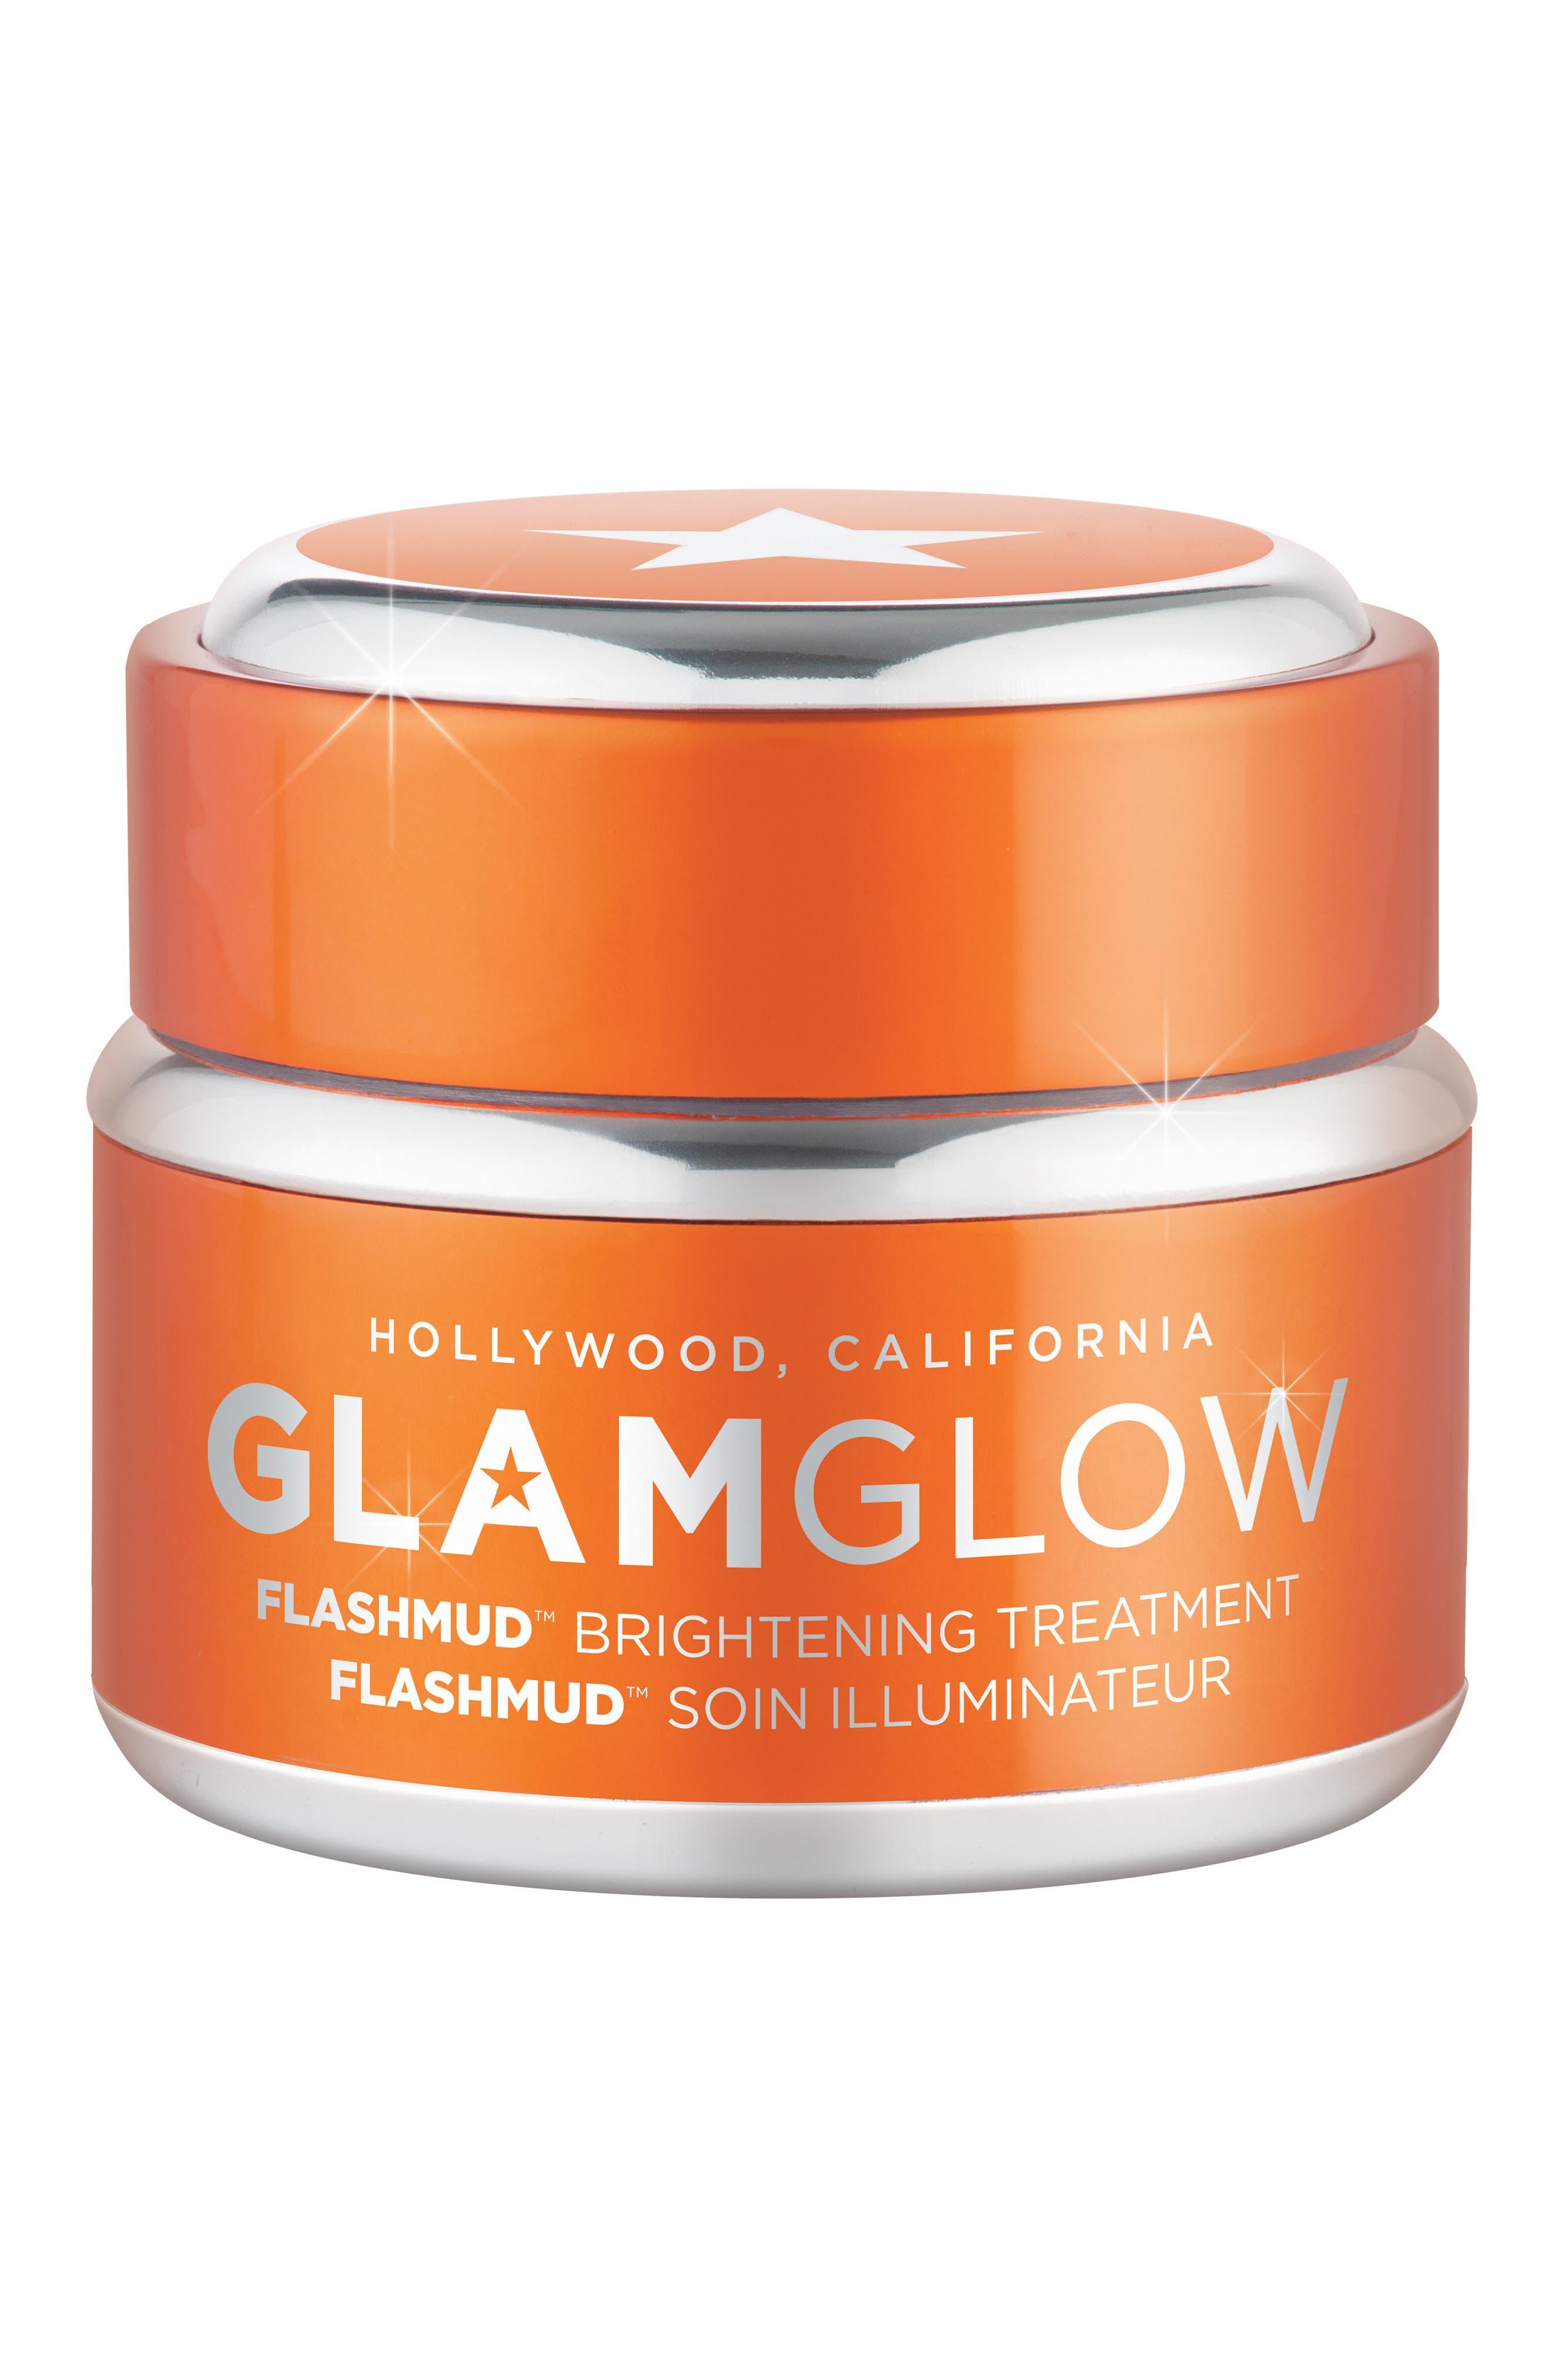 FLASHMUD<sup>™</sup> Brightening Treatment,                             Main thumbnail 1, color,                             NO COLOR